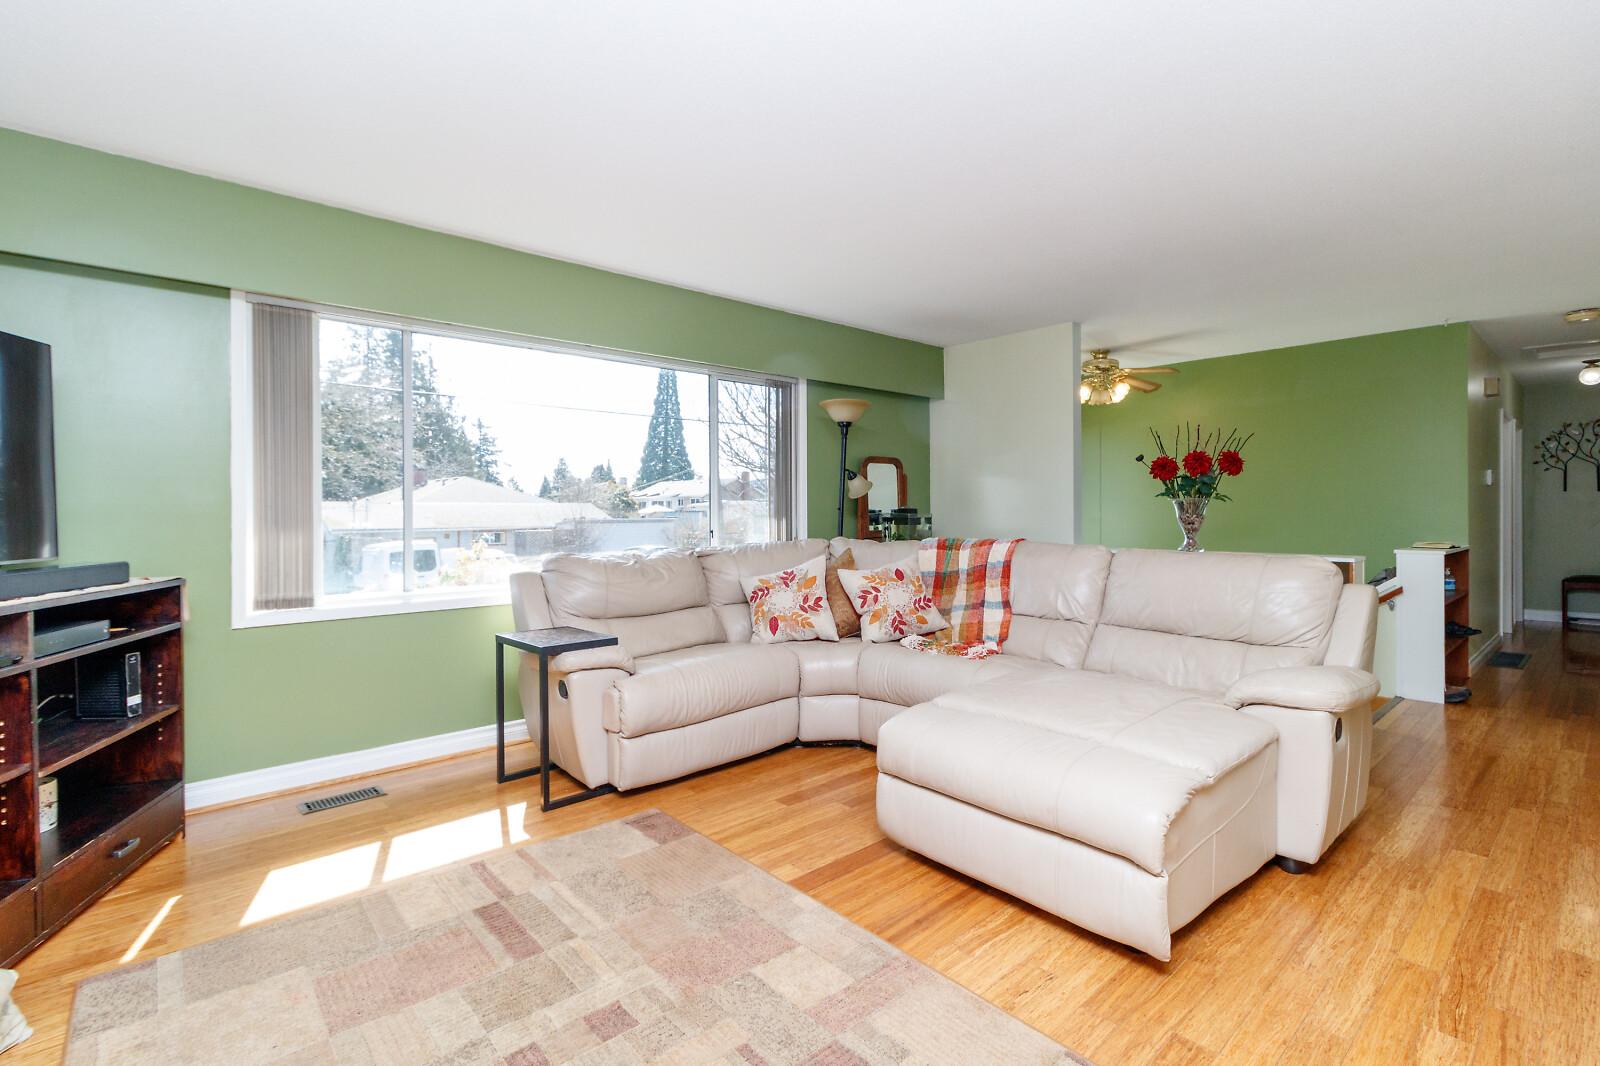 3025 Dogwood Rd, Duncan, British Columbia  V9L 6R5 - Photo 3 - 871254